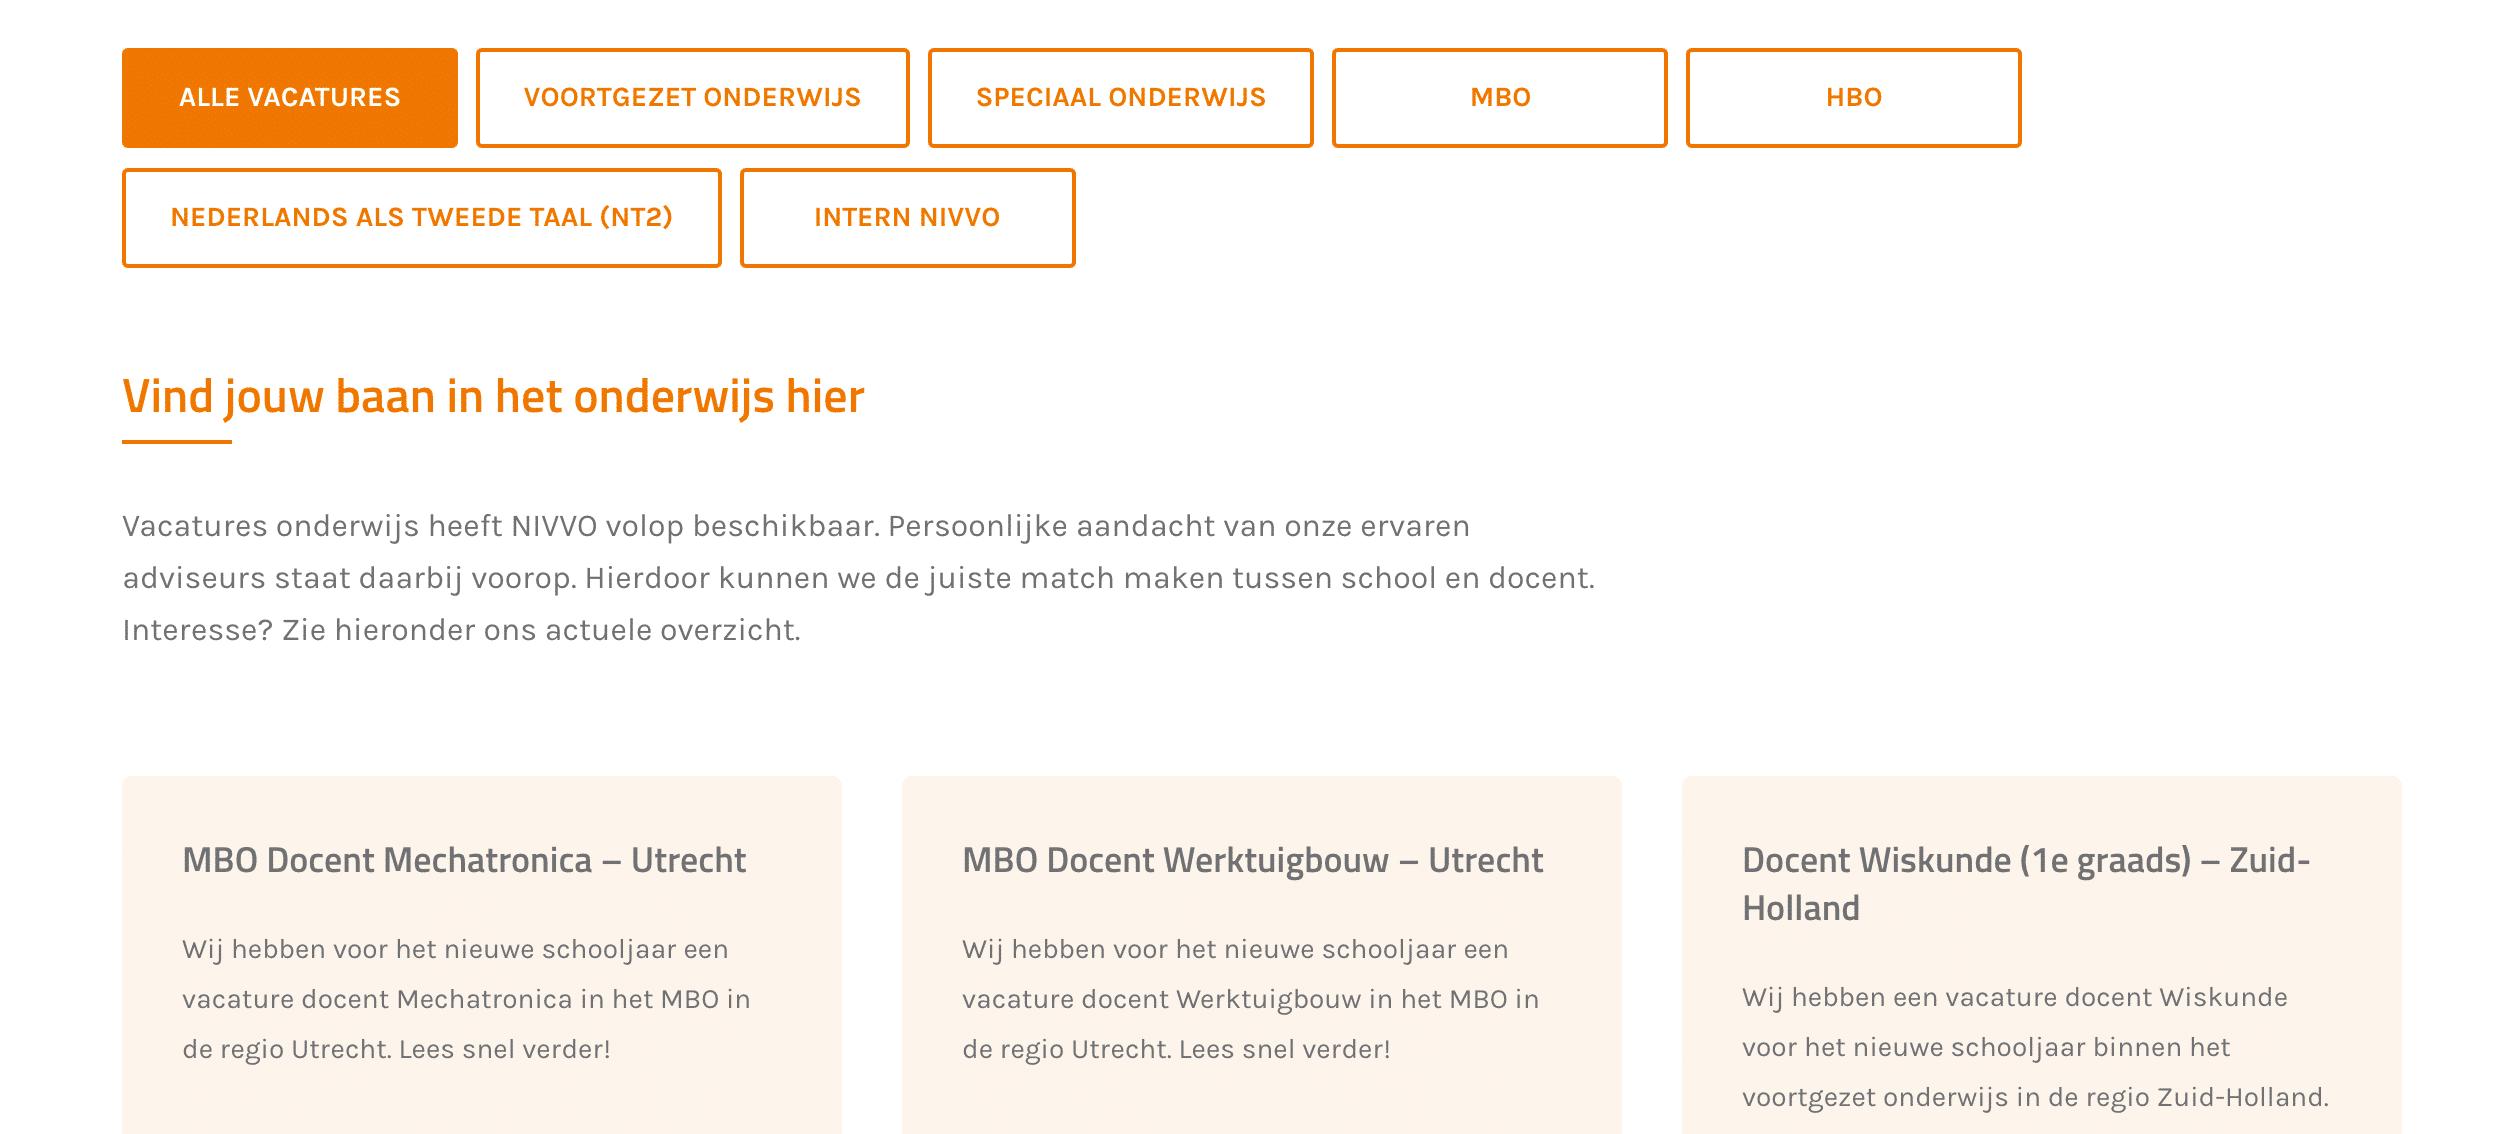 Carerix API koppeling